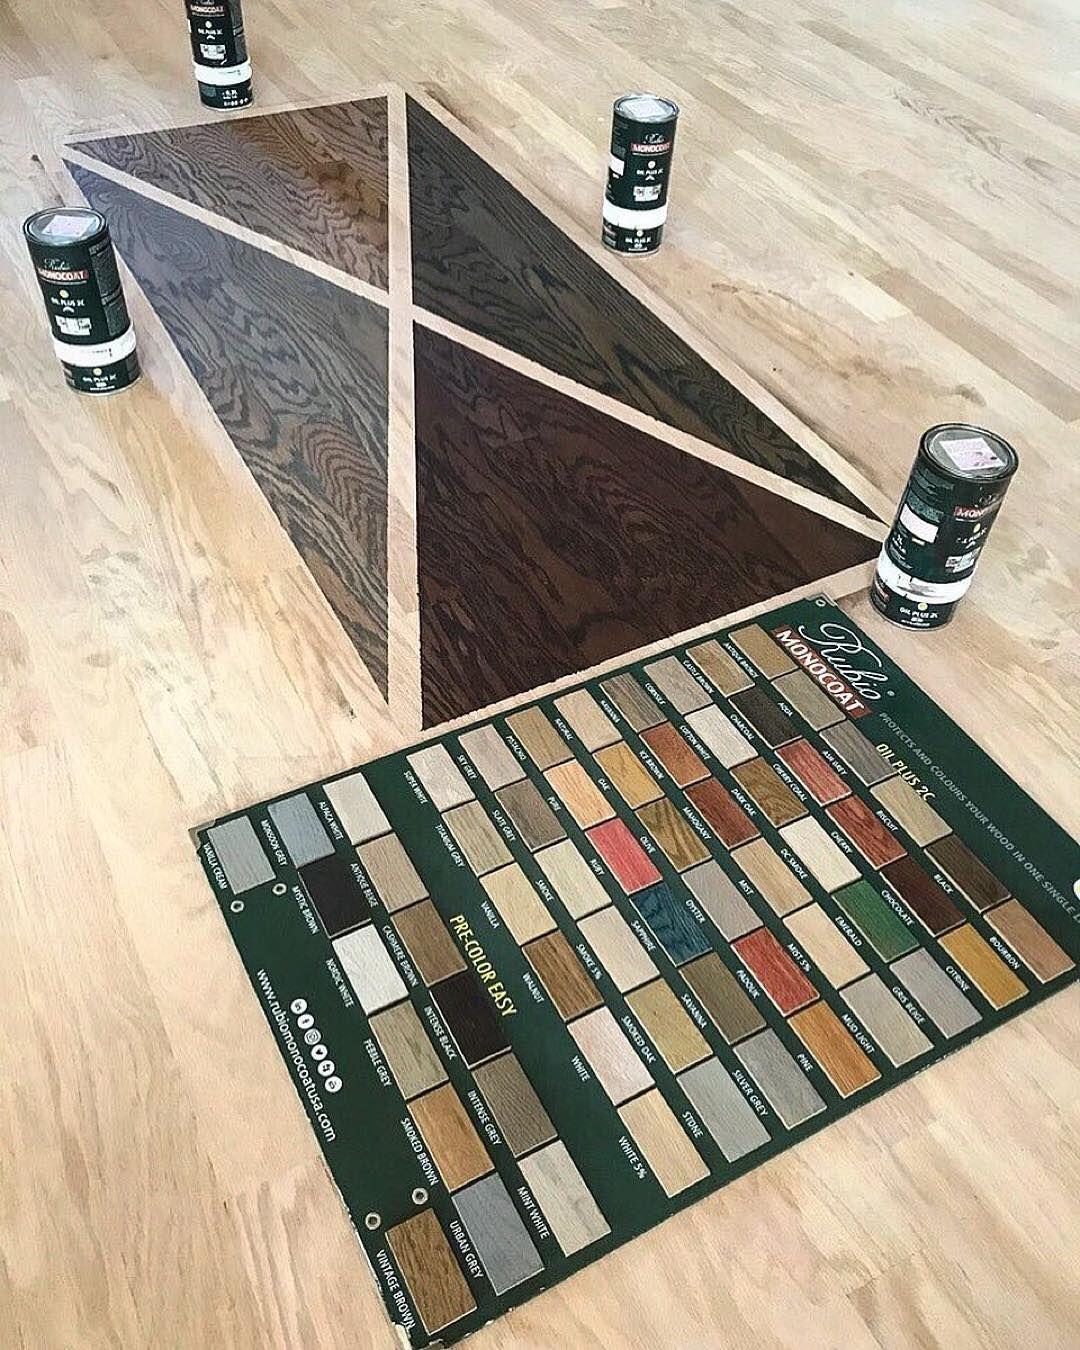 Rubio Monocoat Usa Rubiomonocoatusa Instagram Photos And Videos Rubio Monocoat Wood Floors Flooring